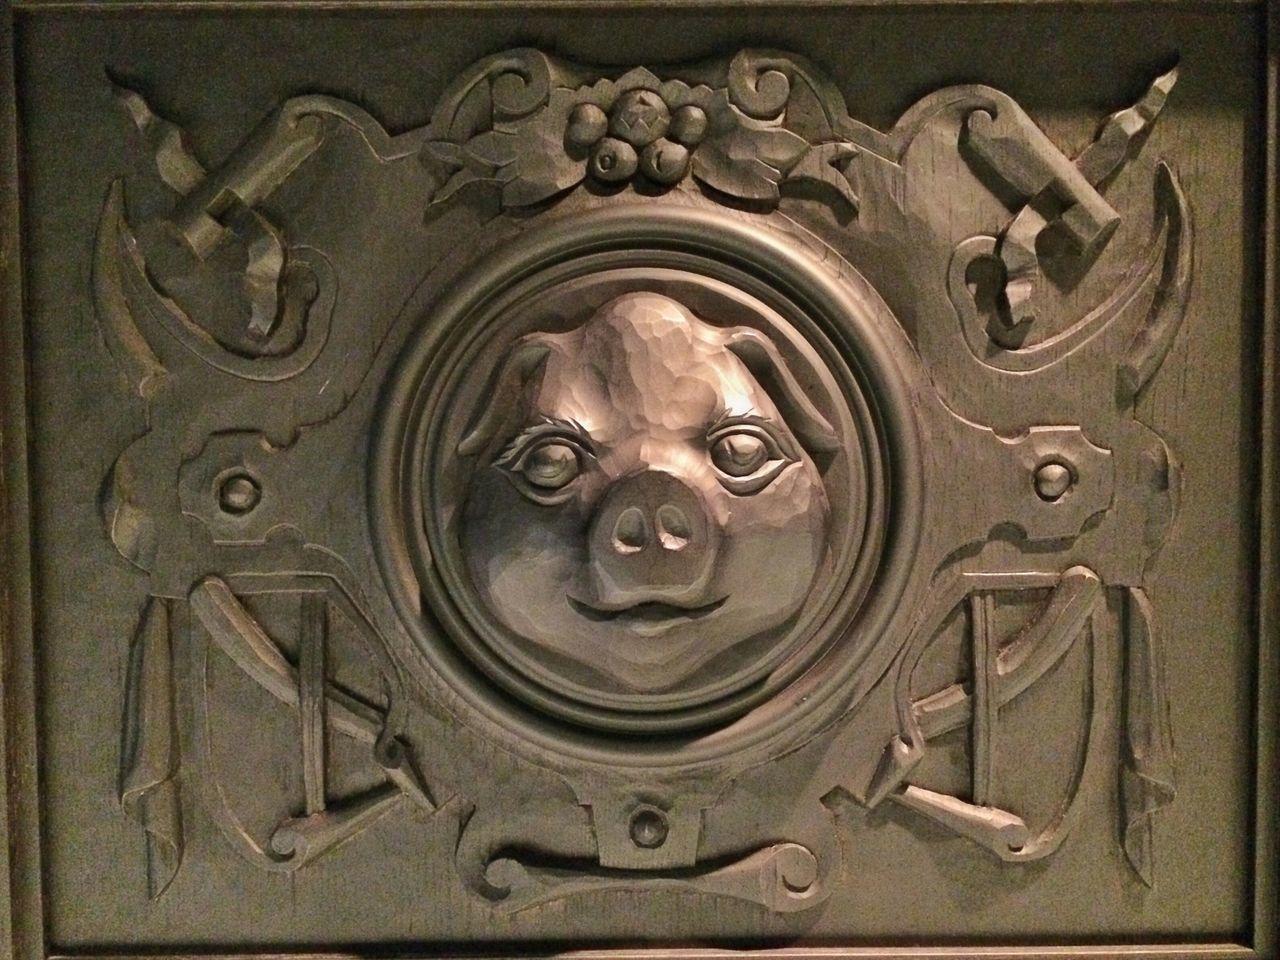 Piggy Pig Relief Relief Sculpture Quirky